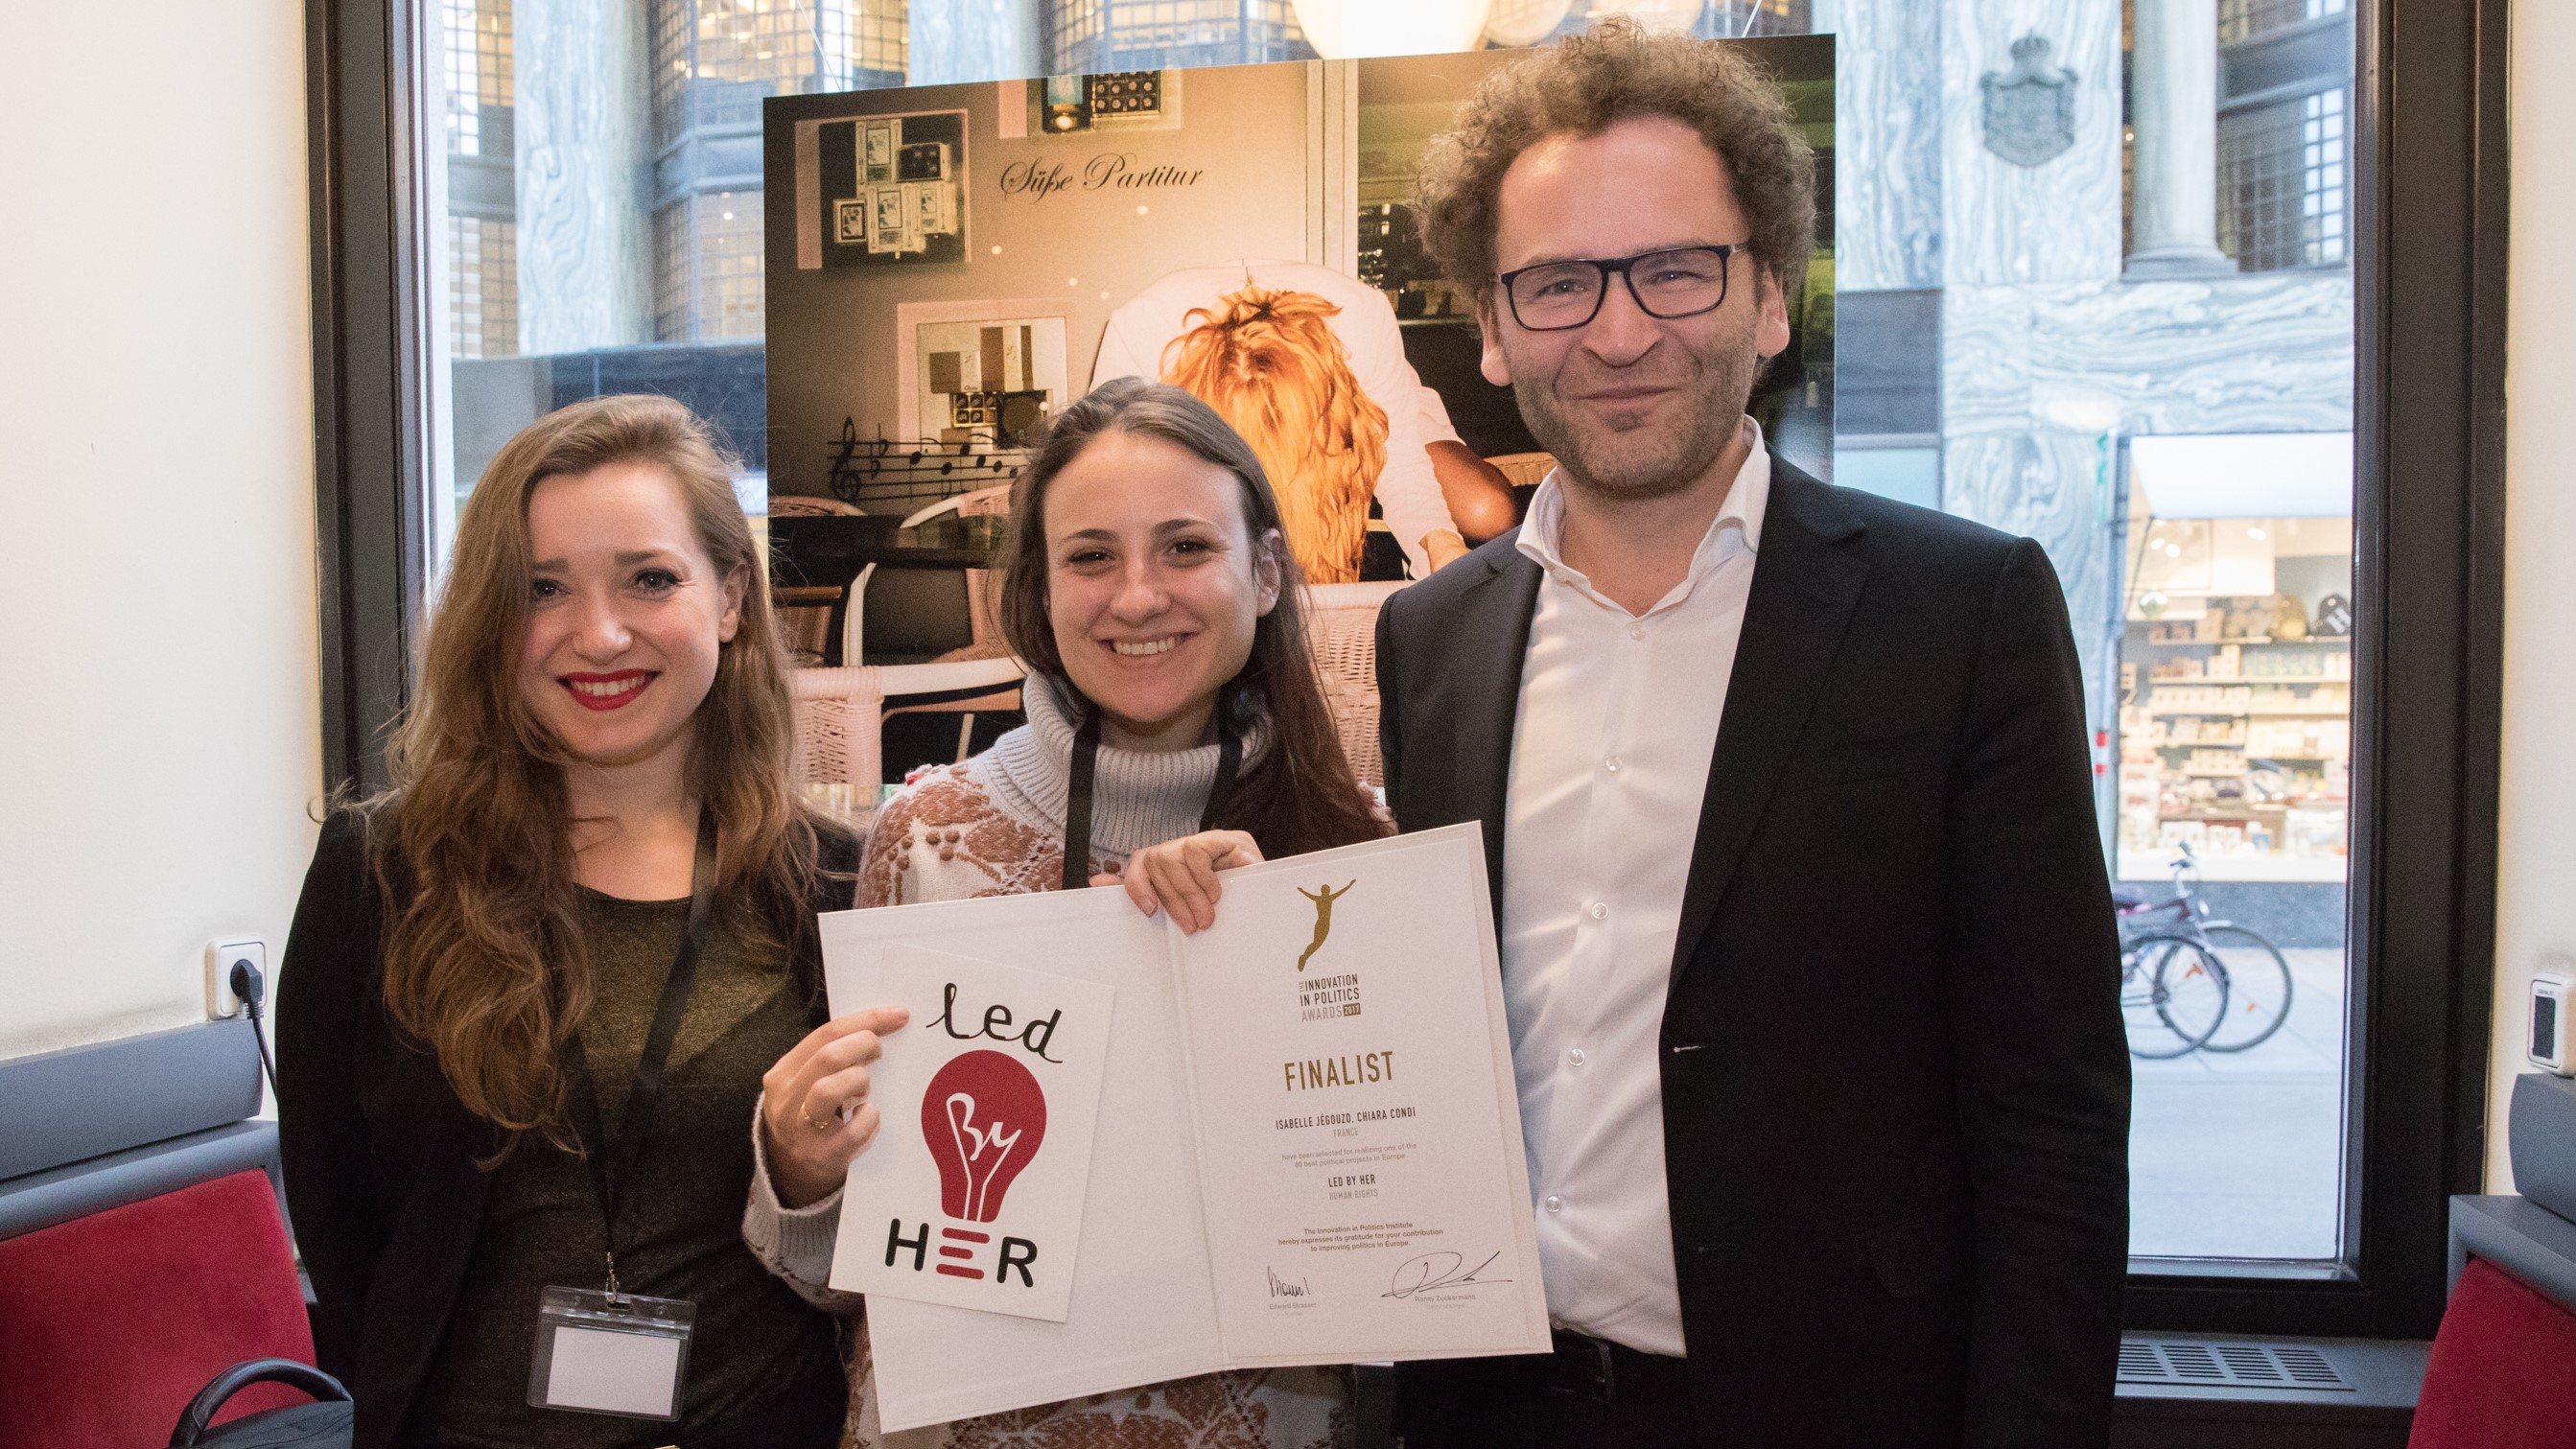 Feminismus, Frauen, PolitikerInnen, Gewalt gegen Frauen, Europa, Political Innovation Award 2017